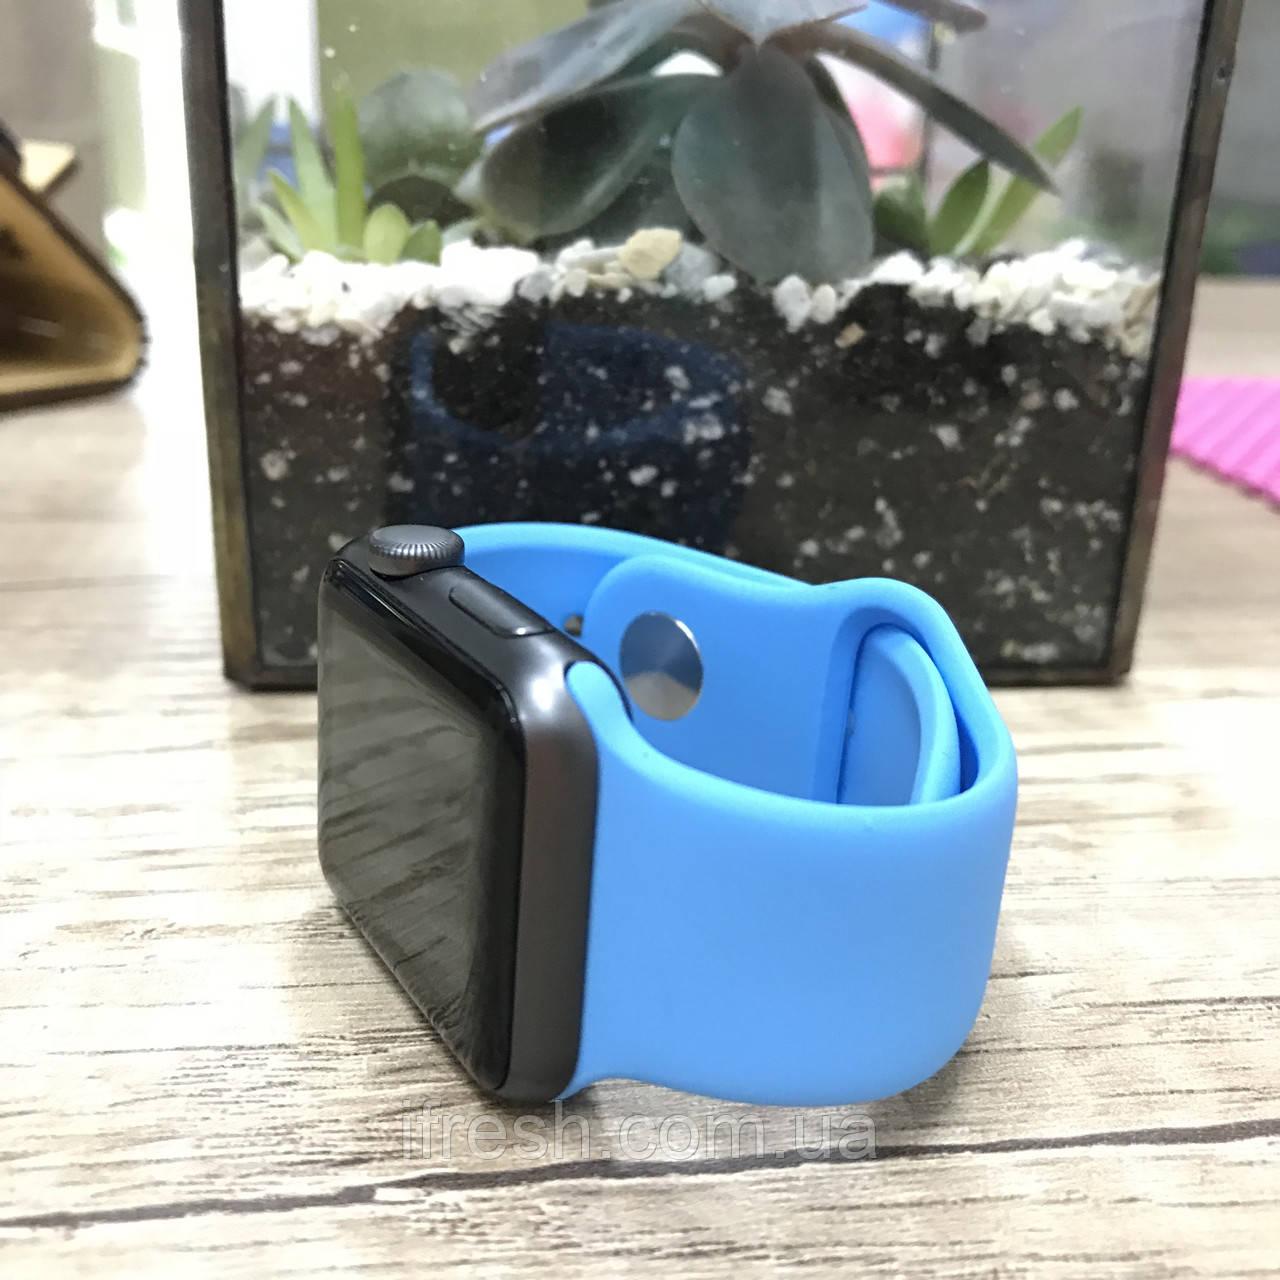 Ремешок для Apple Watch 42mm, голубой, LIGHT BLUE